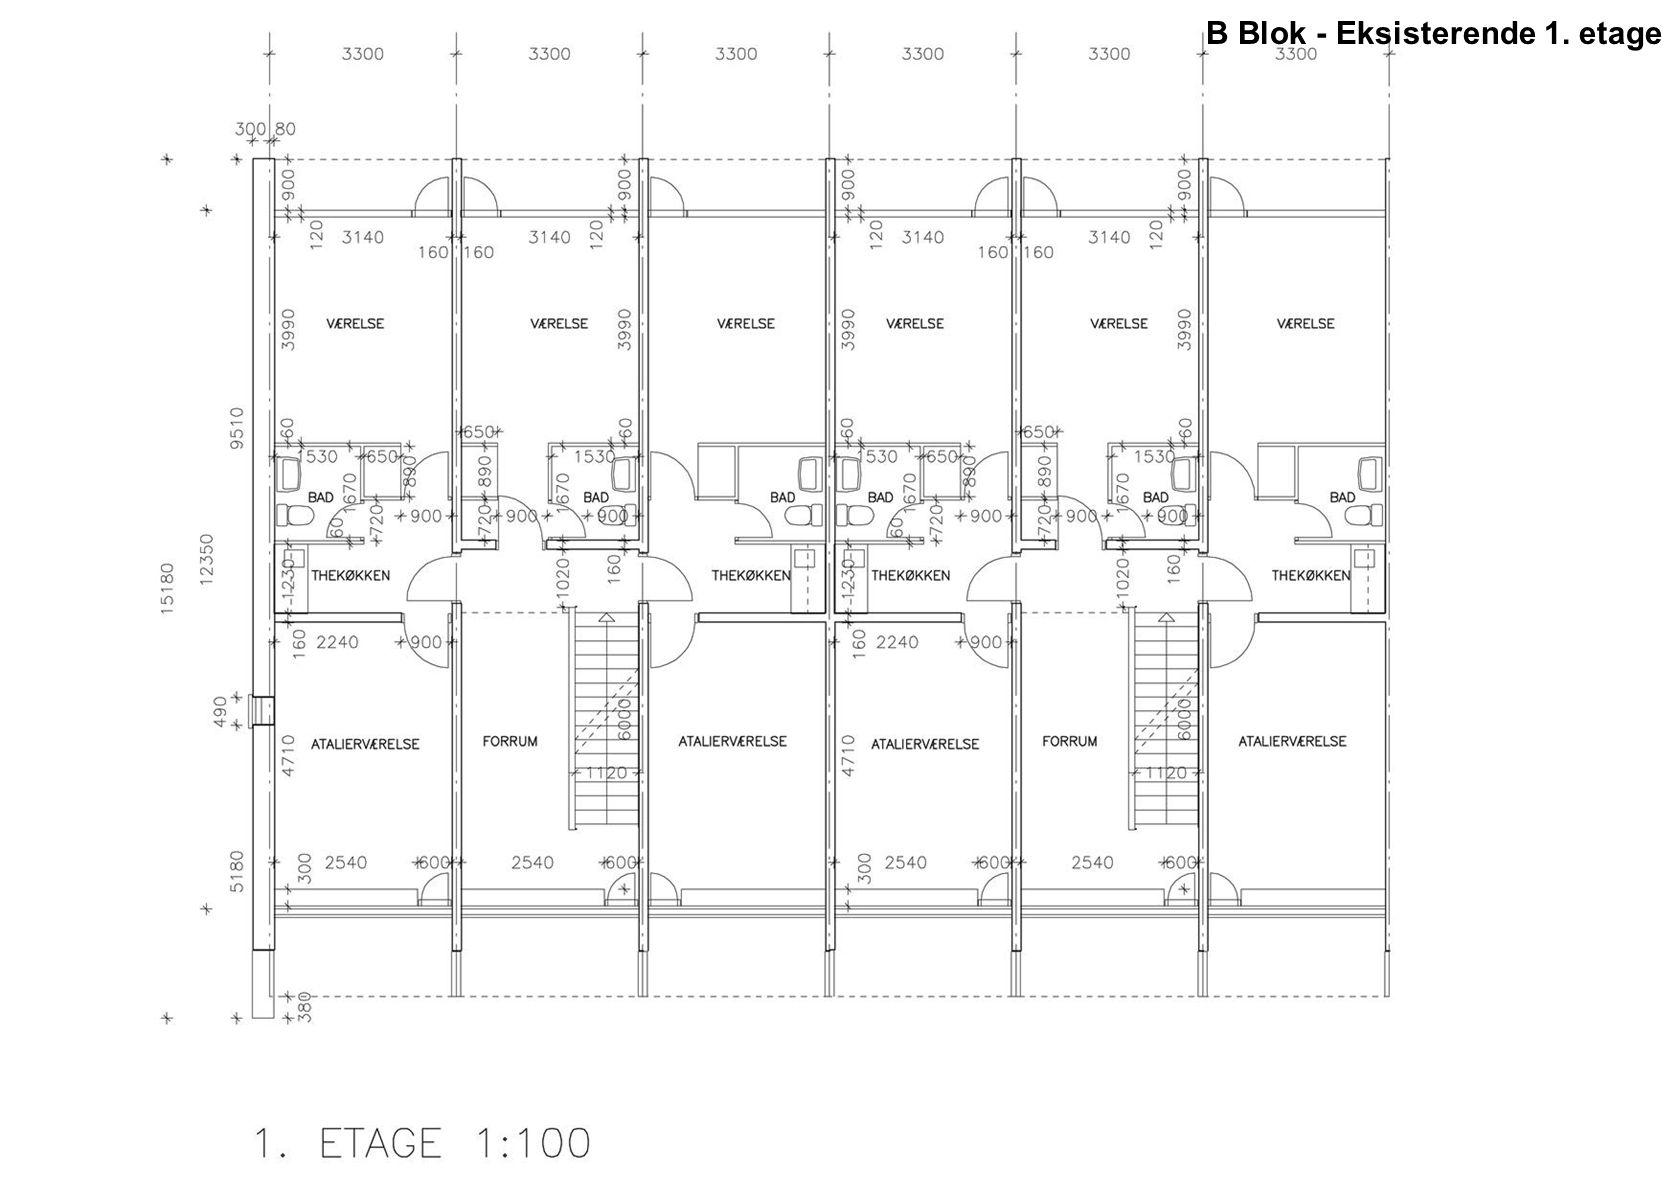 B Blok - Eksisterende 1. etage